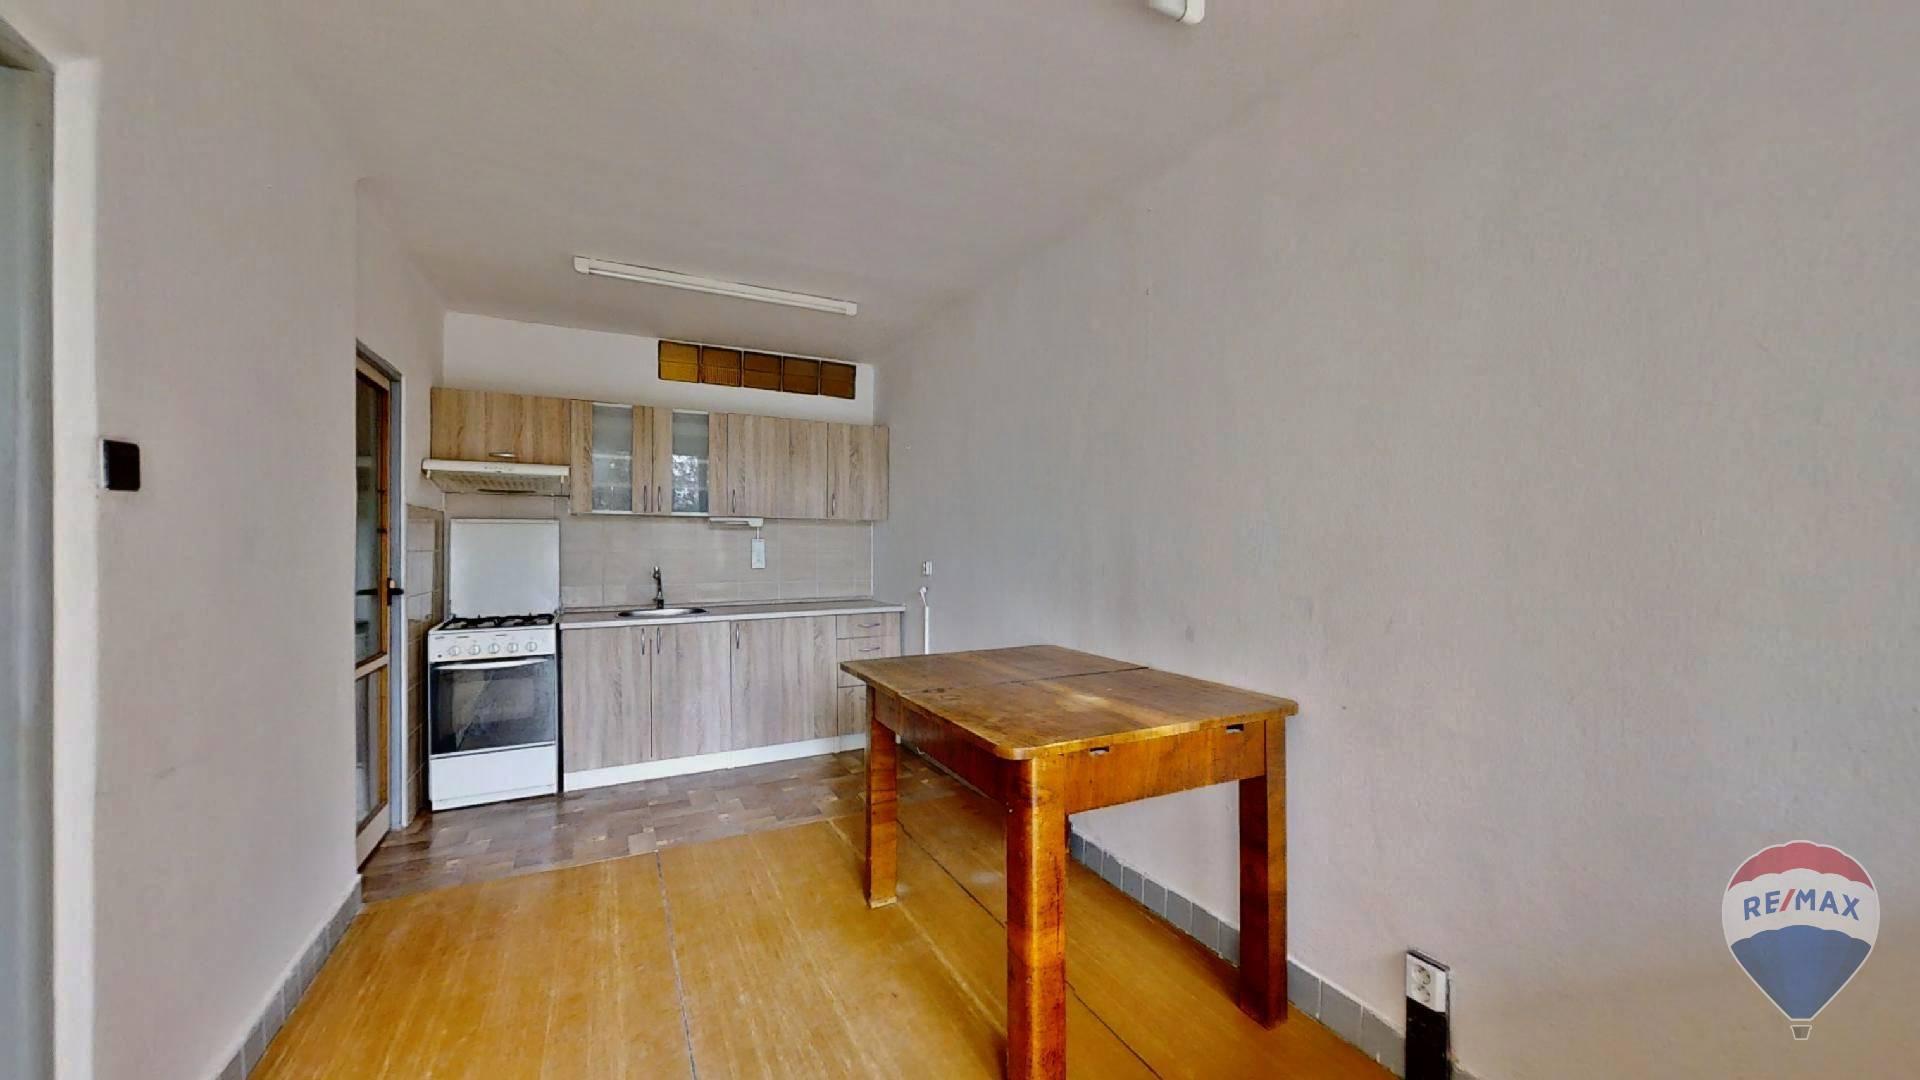 Predaj bytu (4 izbový) 75,5 m2 + loggia